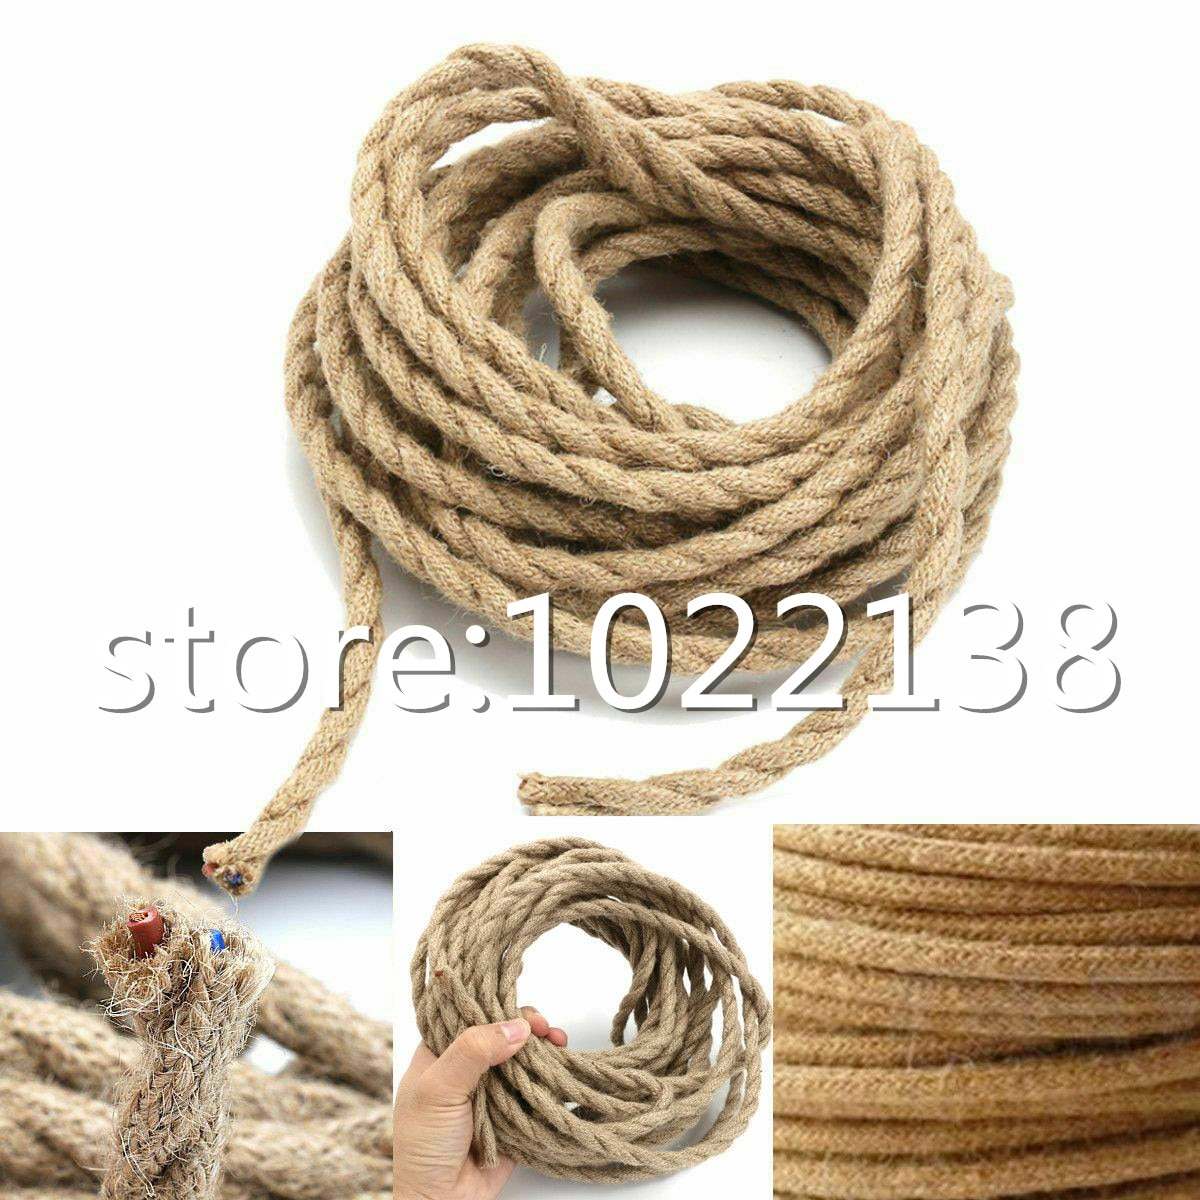 Cable trenzado de cuerda de cáñamo, 18 alambre de cobre Awg, Cable...